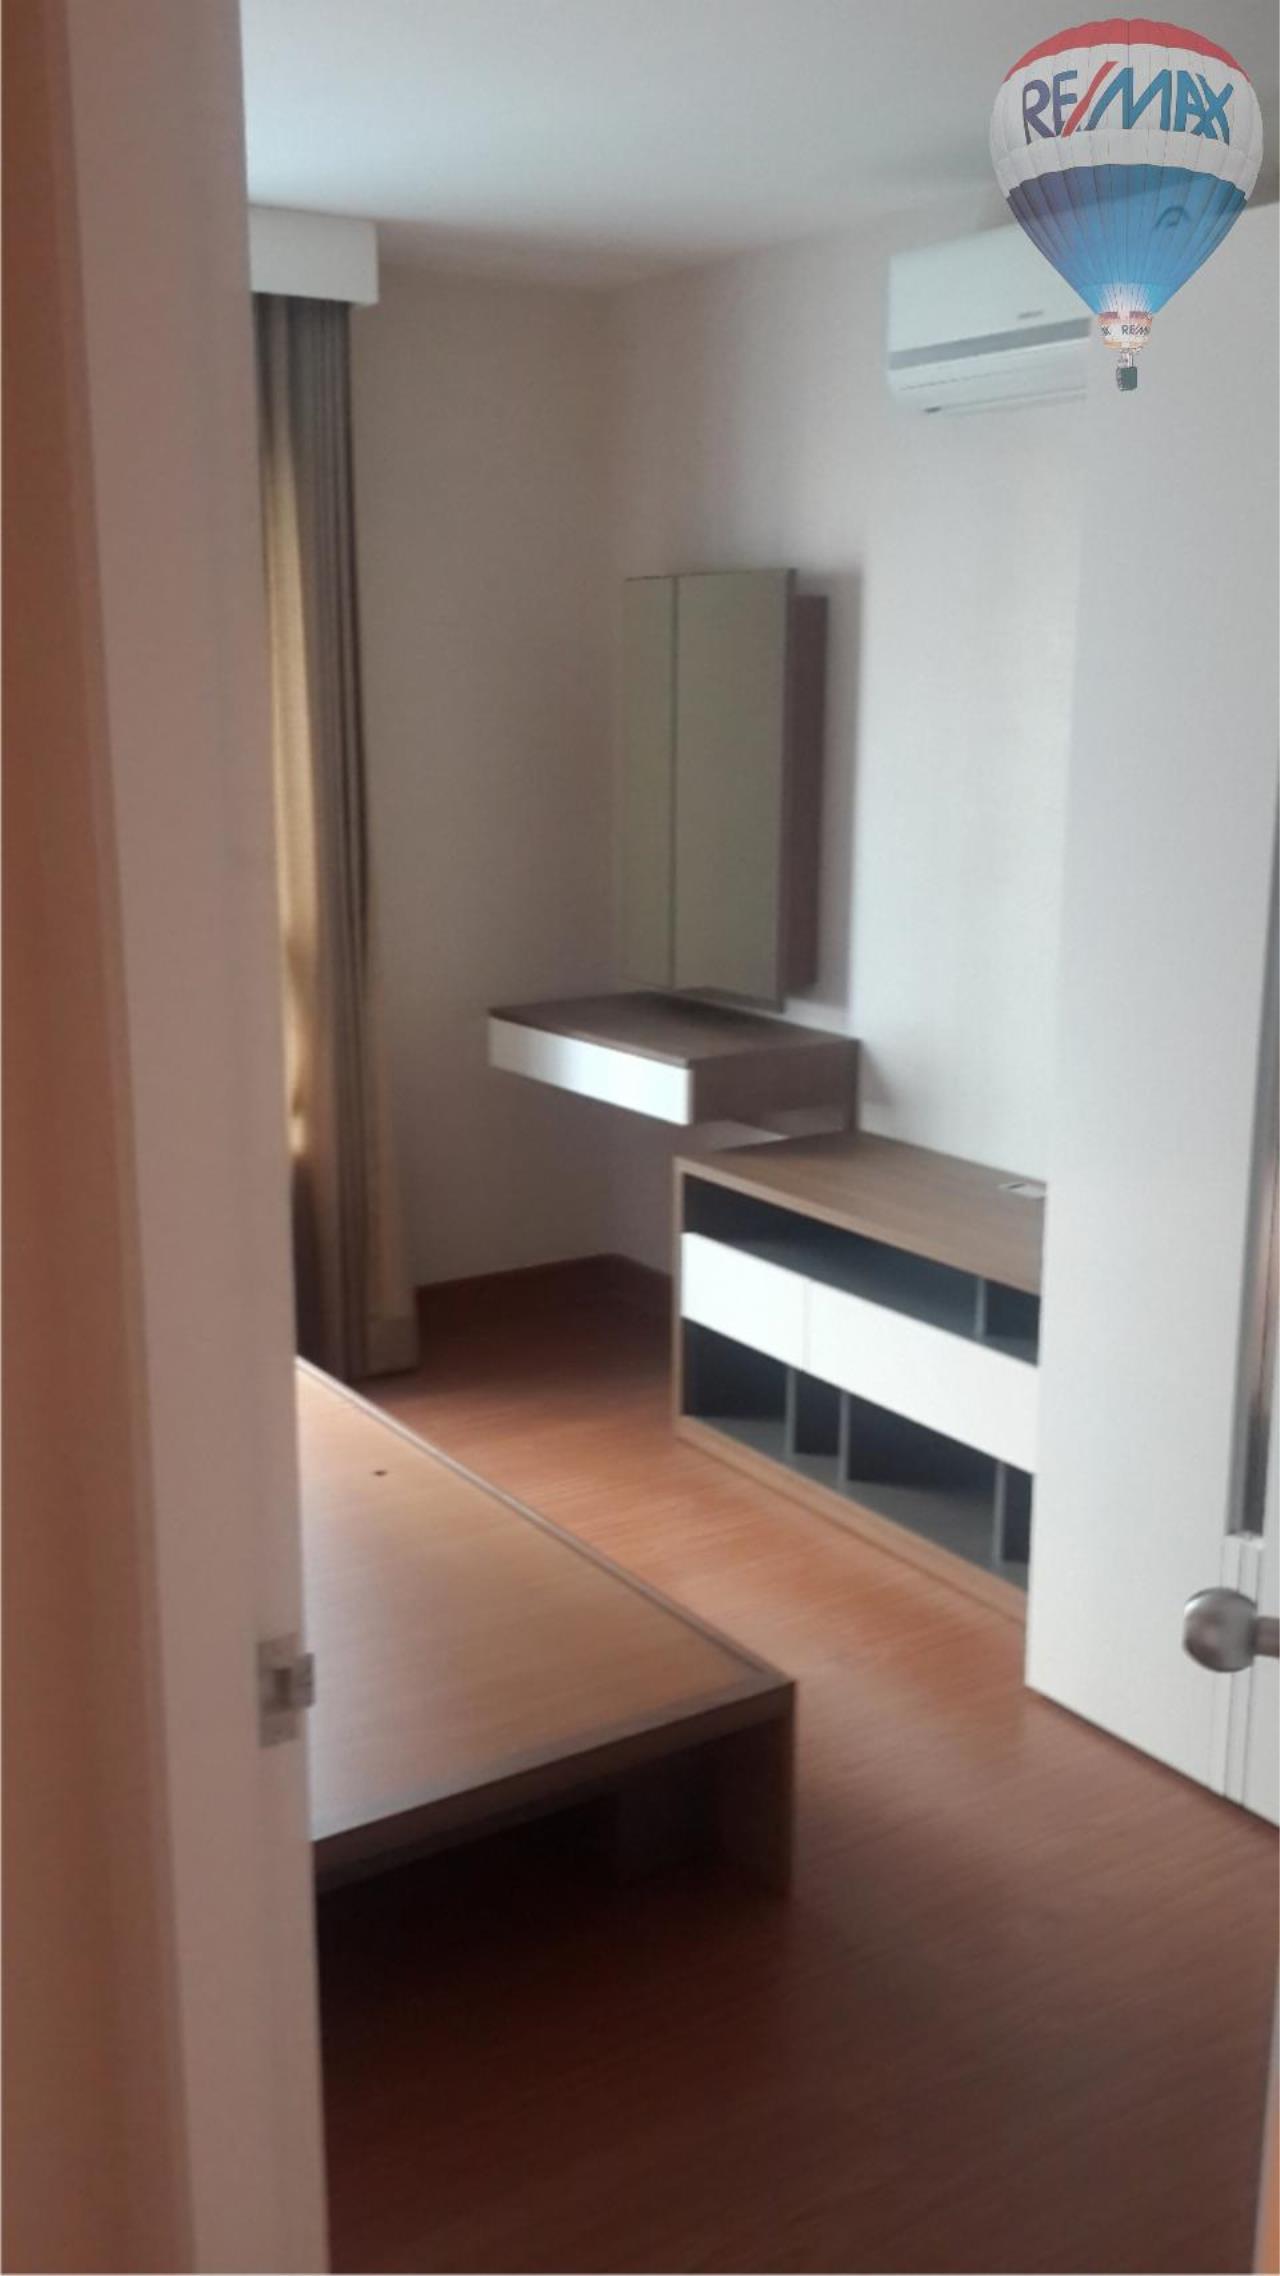 RE/MAX BestLife Agency's the belle rama 9 3 bedroom condo for rent mrt phra rama 9 3